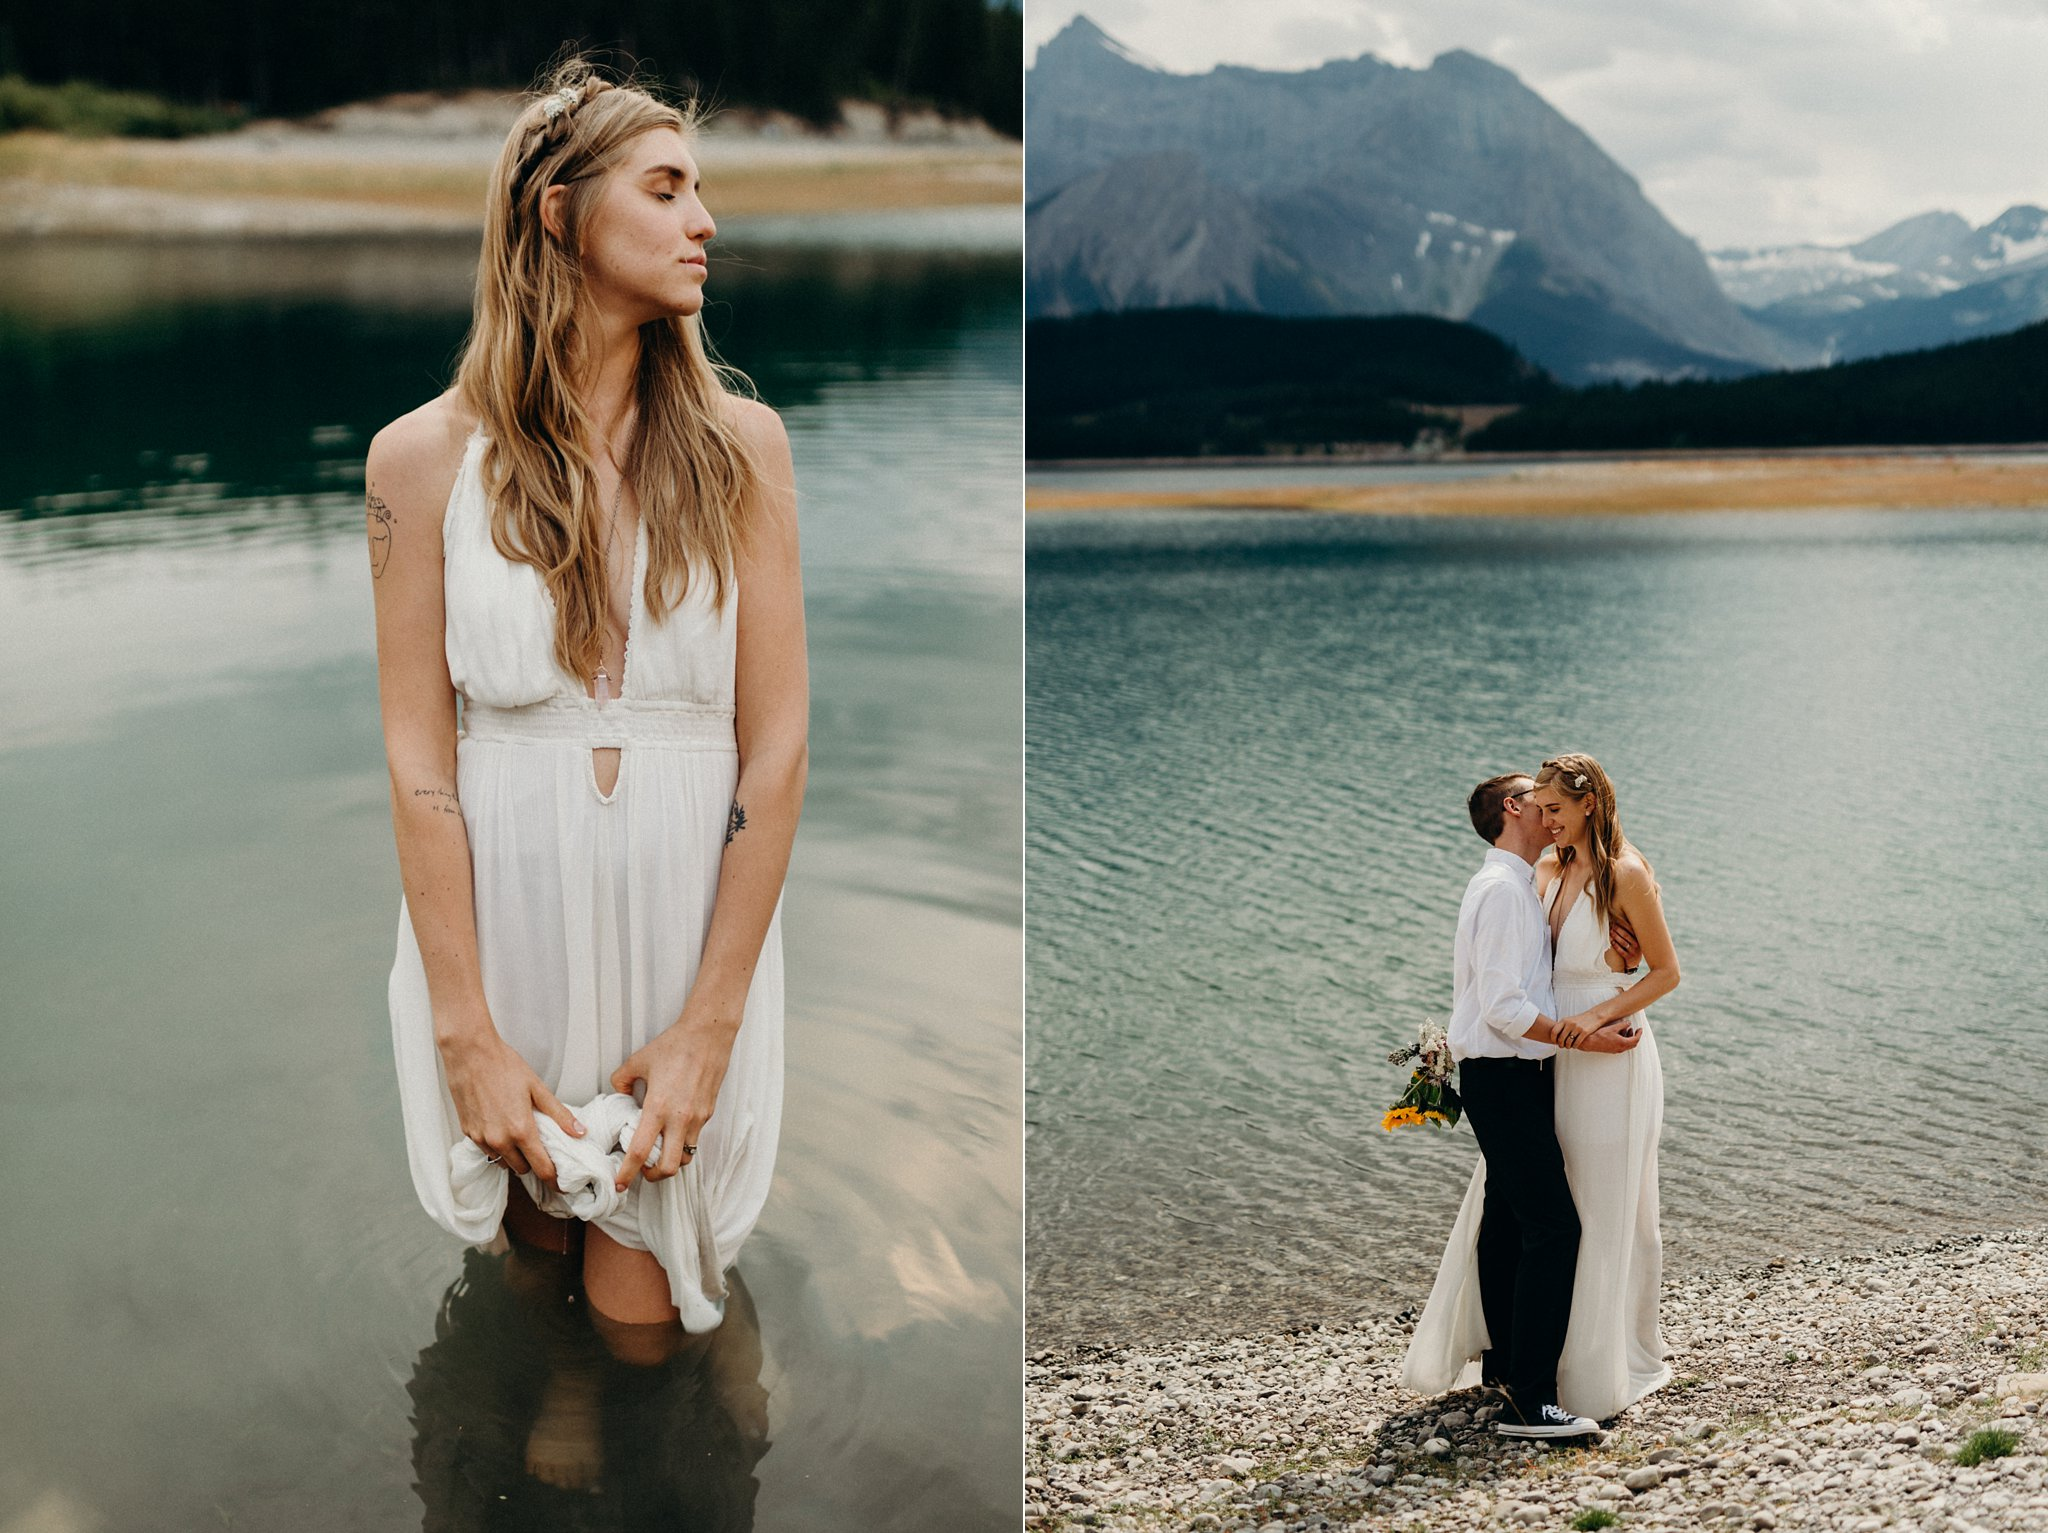 kaihla_tonai_intimate_wedding_elopement_photographer_6446.jpg